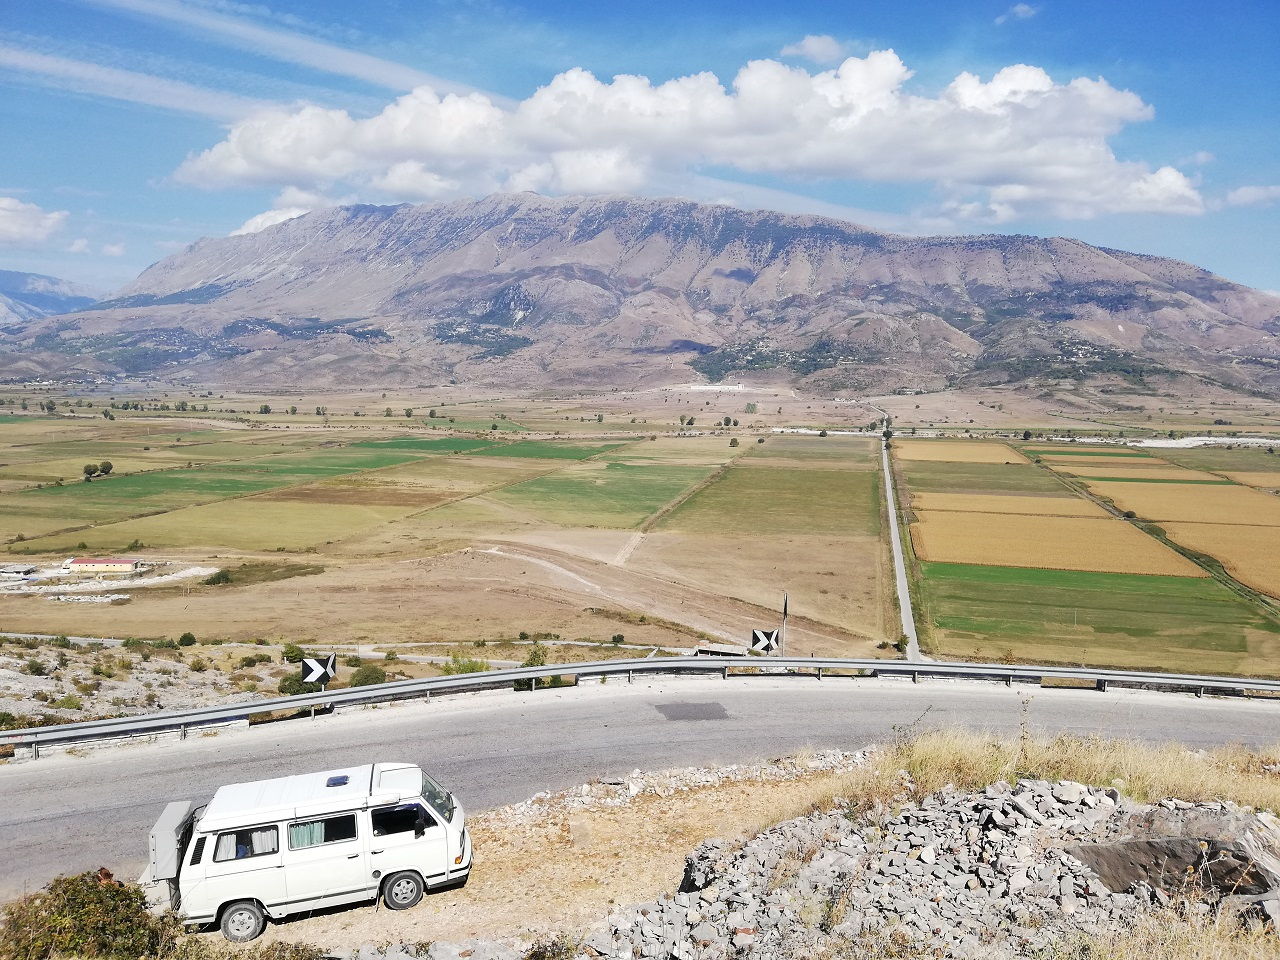 Straße von Ksmail nach Gjirokastra